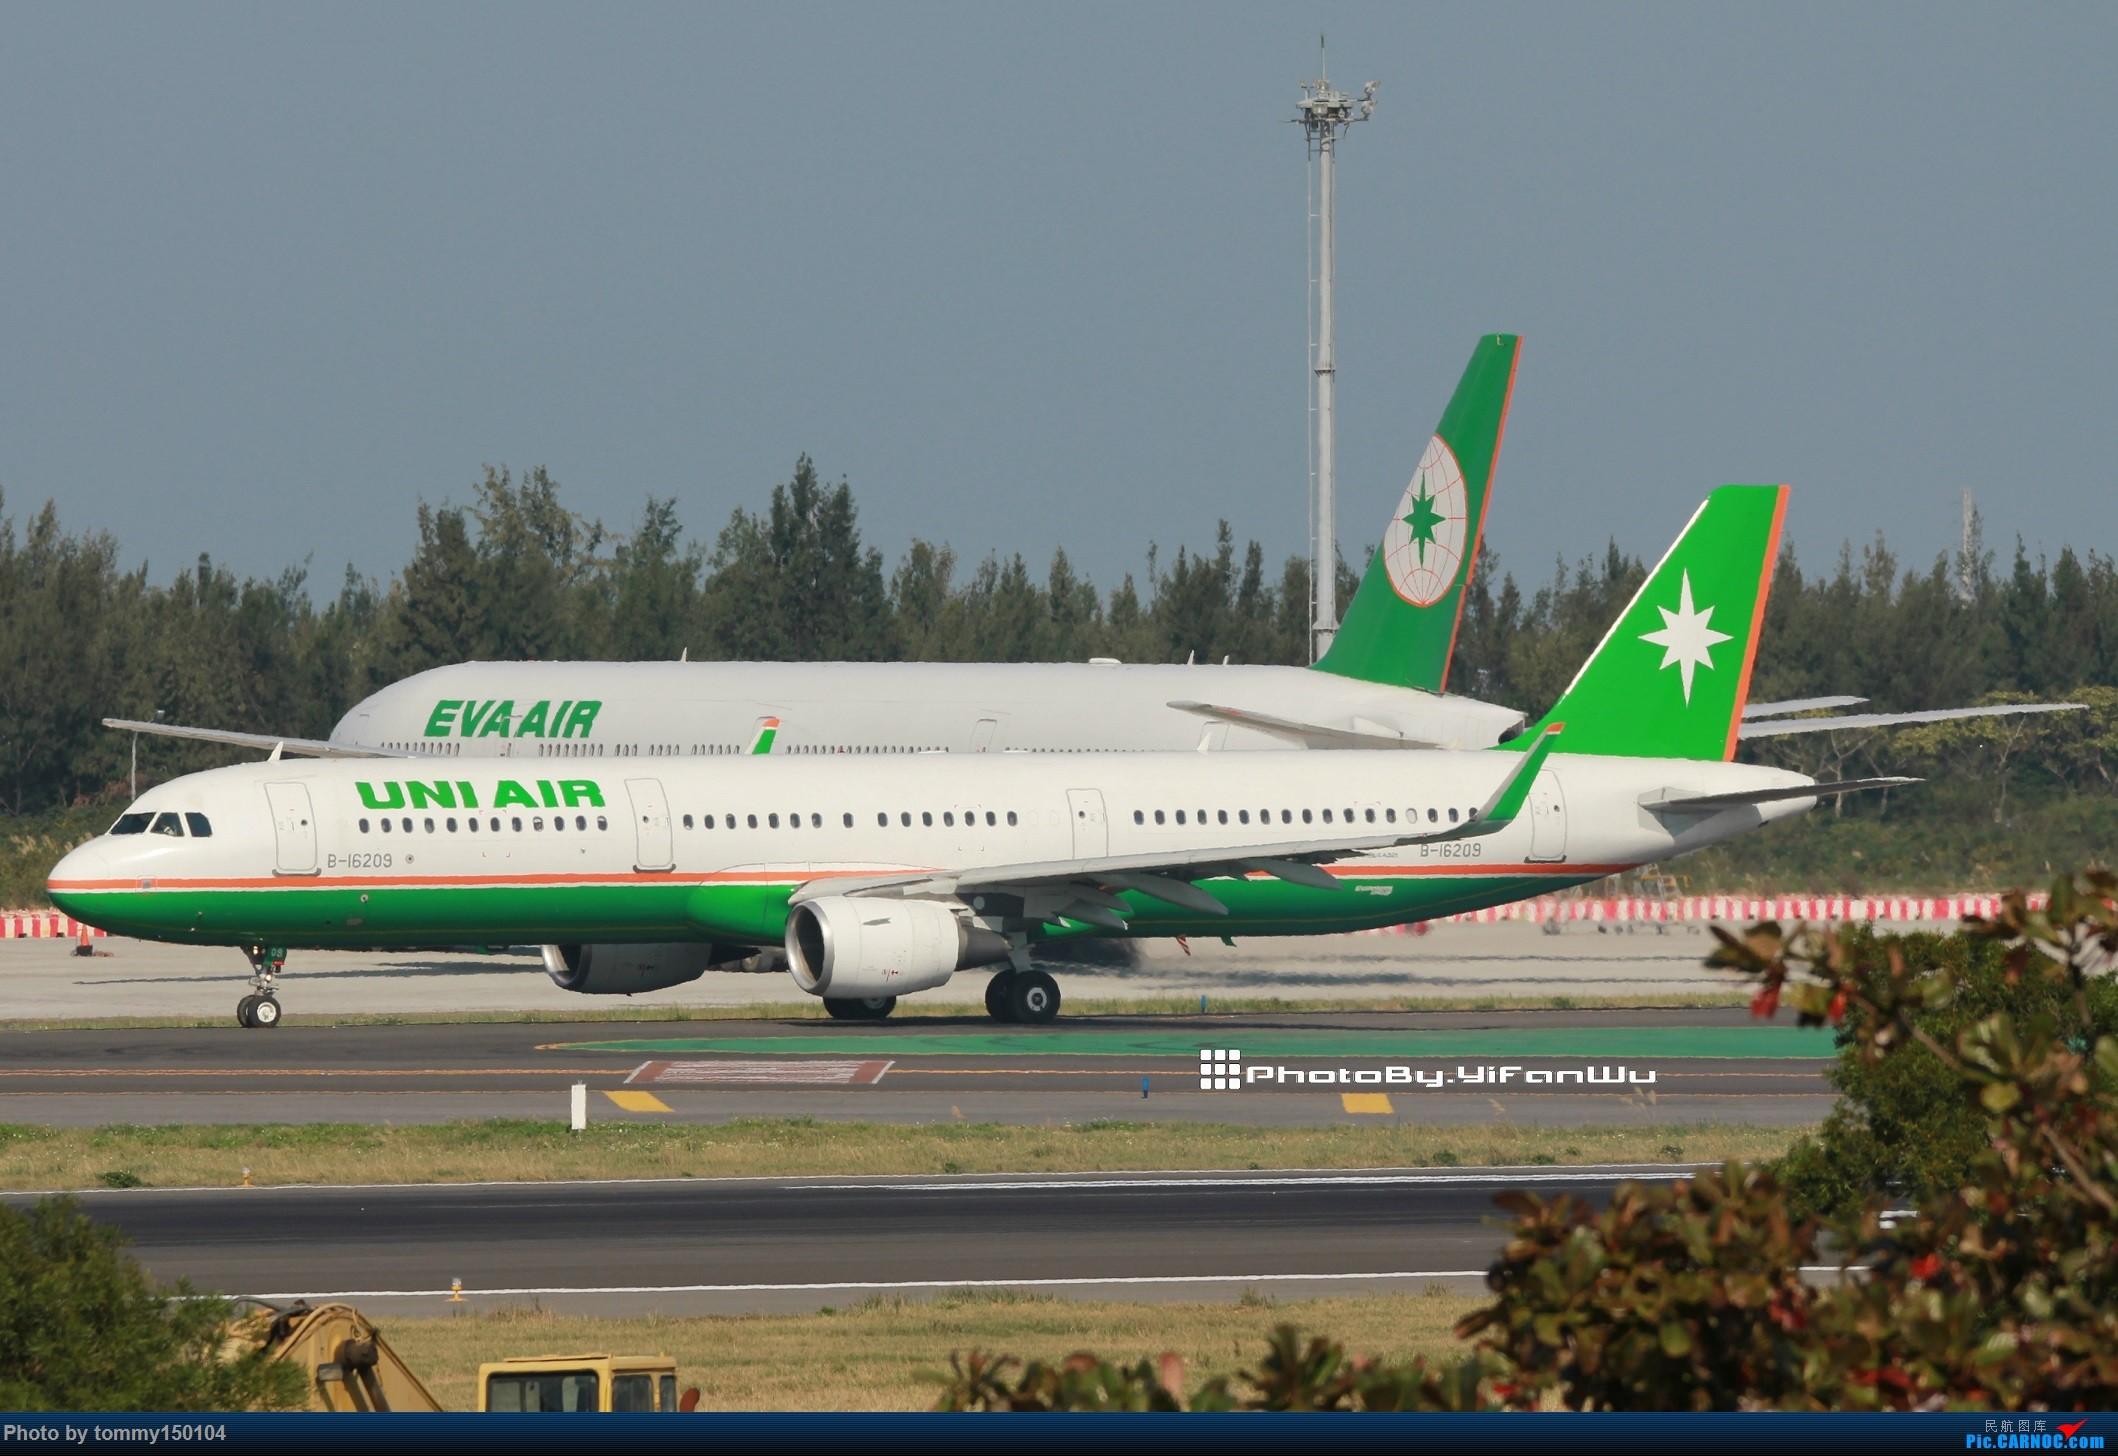 Re:[原创]新手試貼 TPE台北桃園 AIRBUS A321-200 B-16209 中国台北桃园国际机场